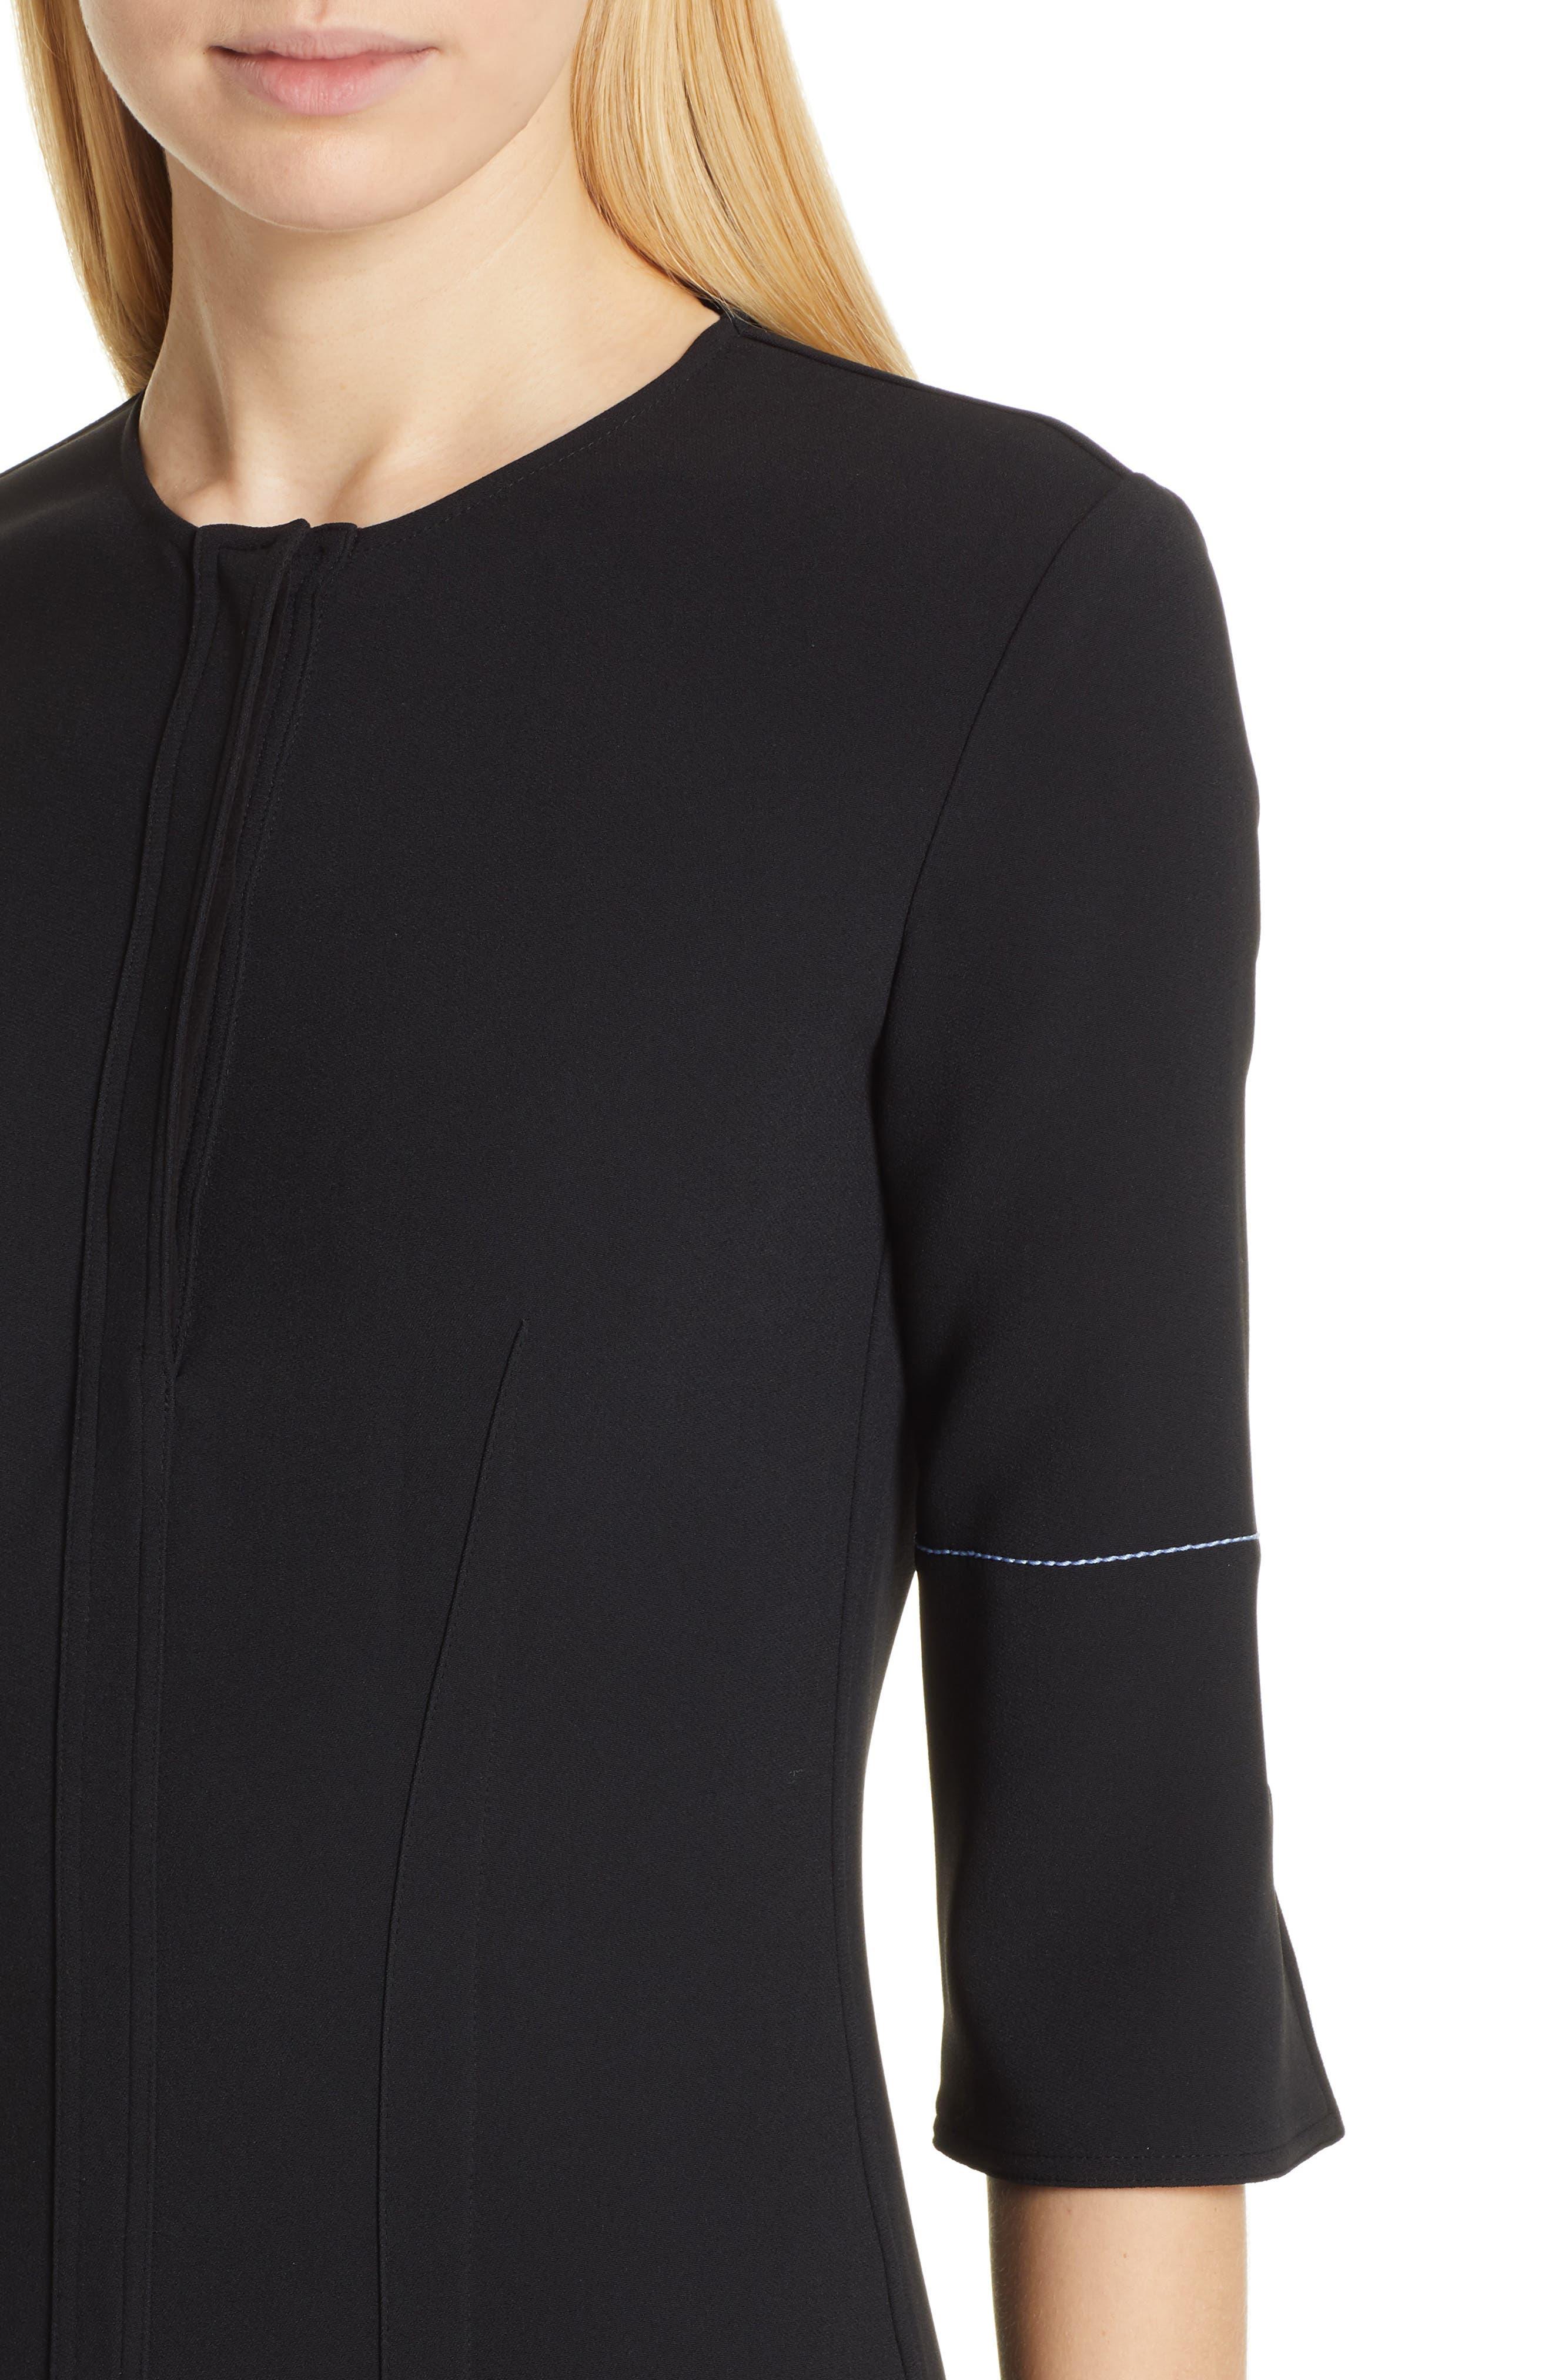 VICTORIA BECKHAM, Contrast Stitch Crepe Dress, Alternate thumbnail 5, color, BLACK